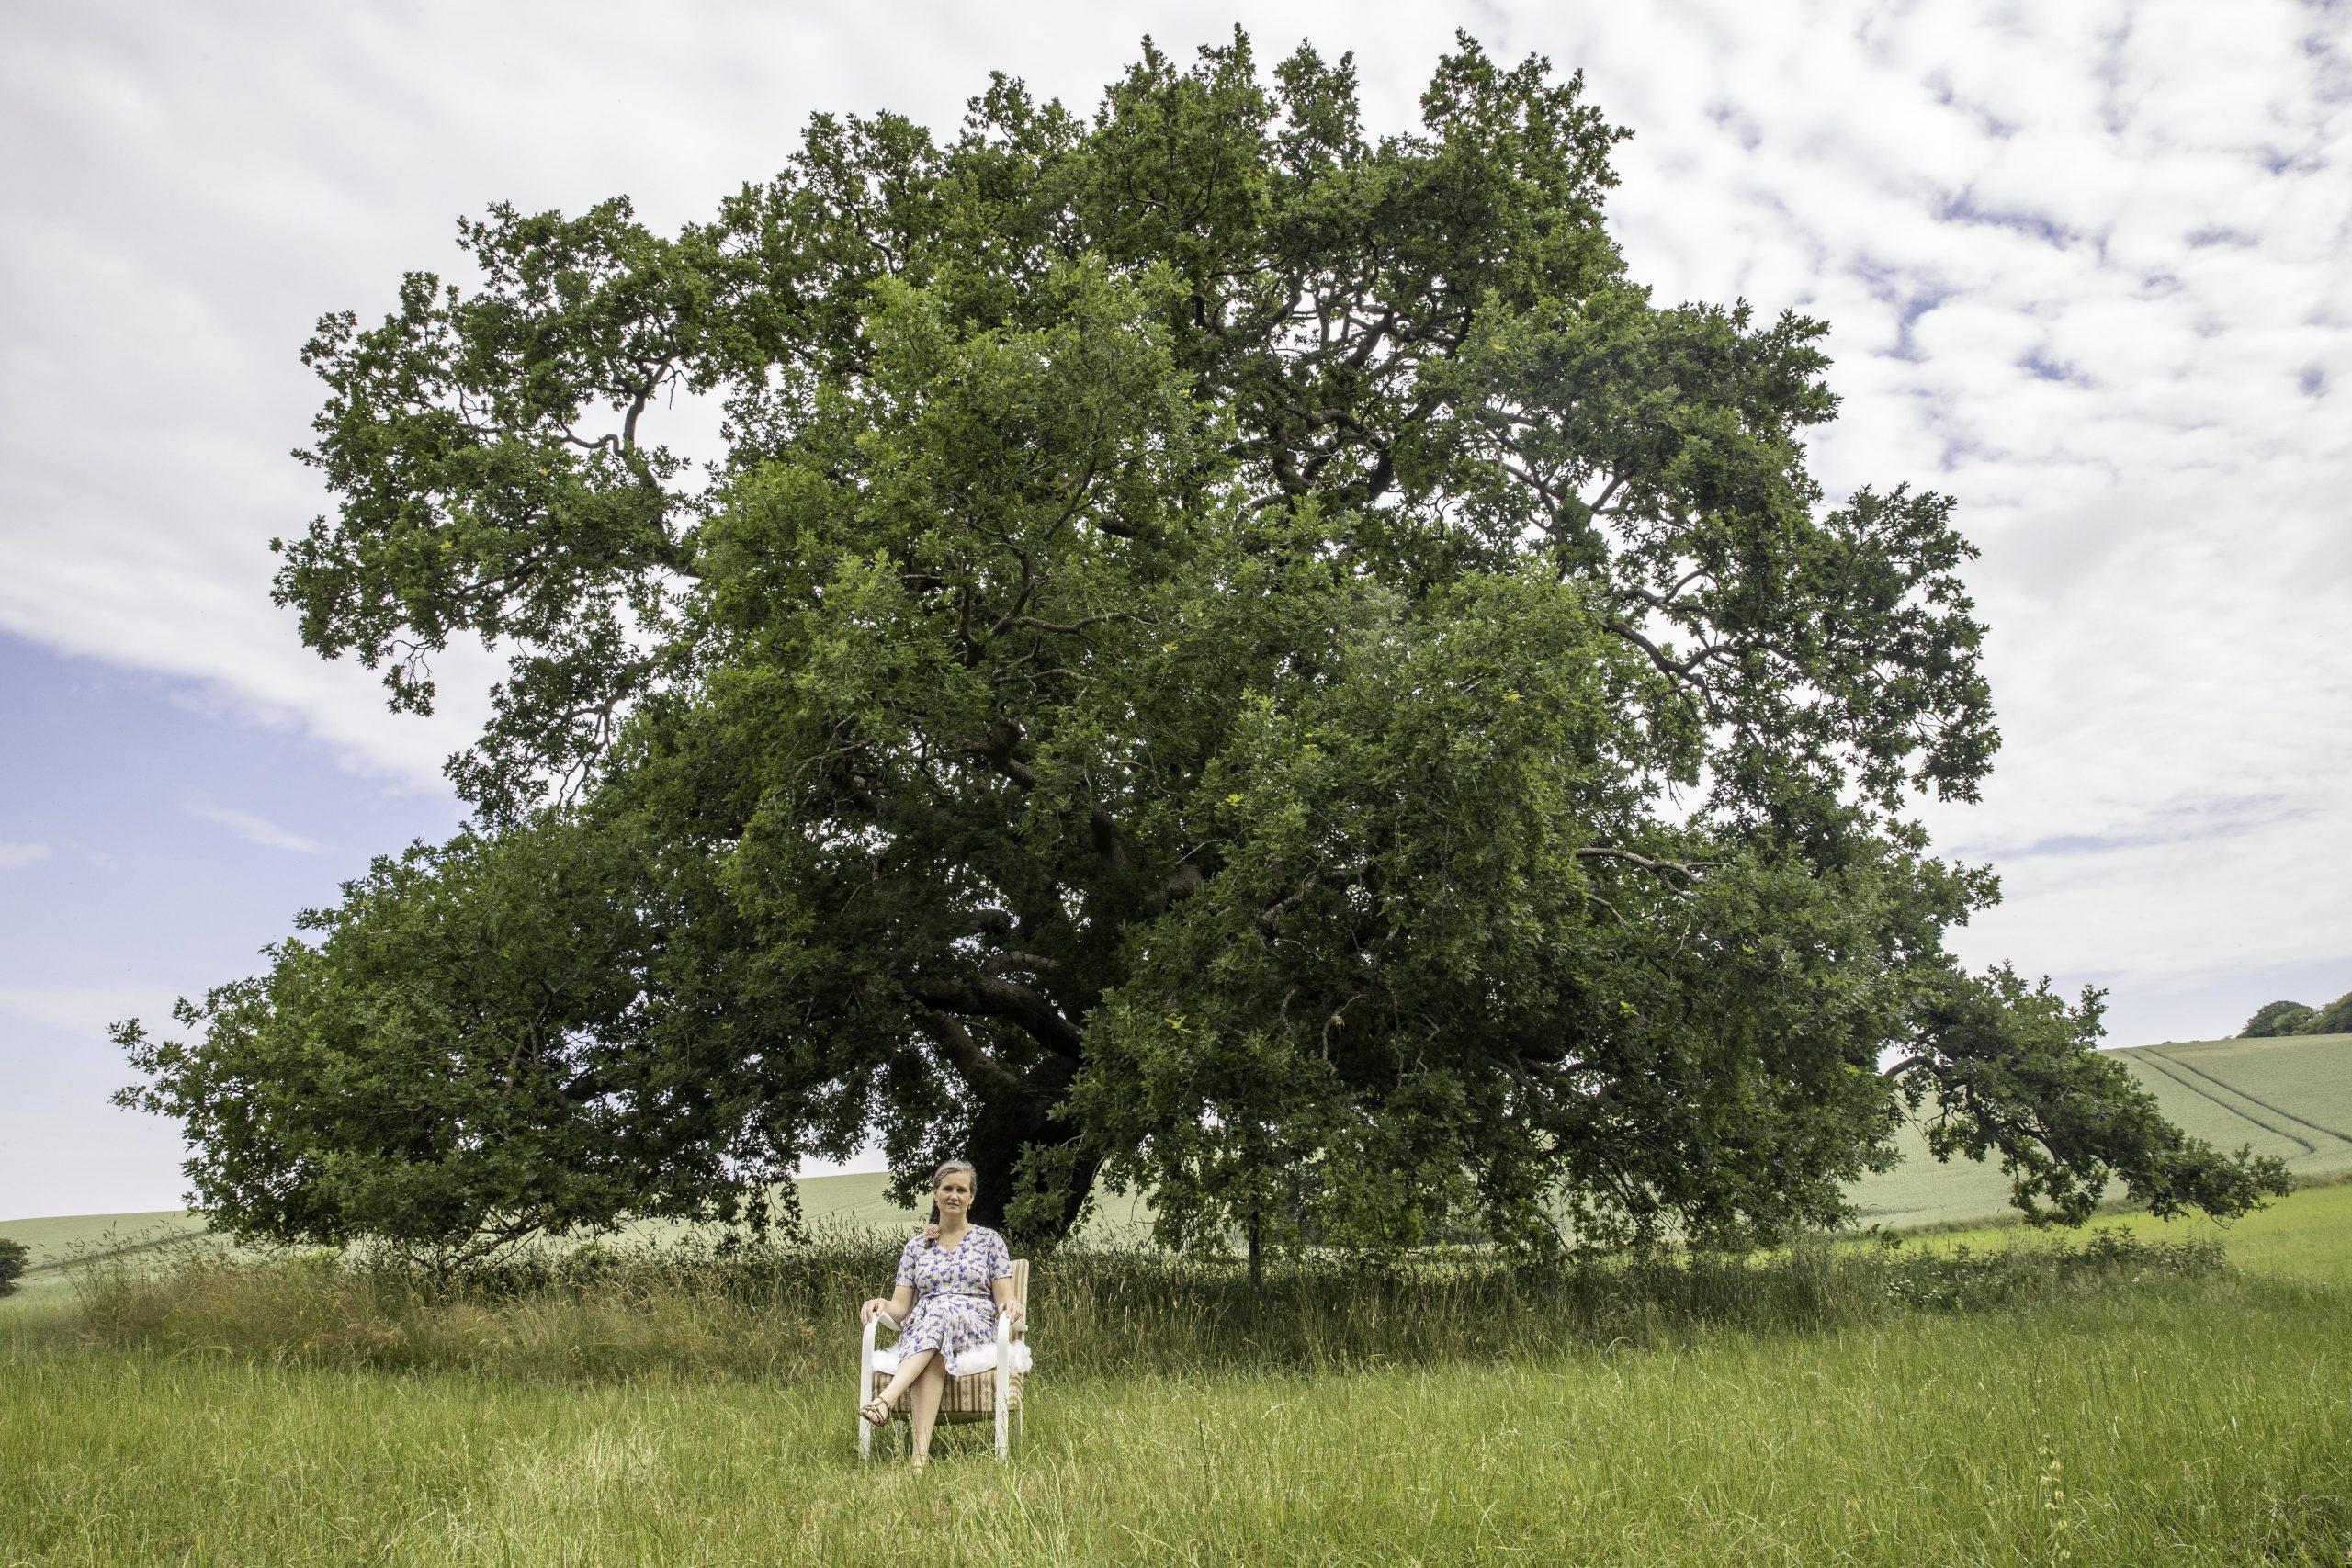 Camaniki coach: Malene sidder under et træ